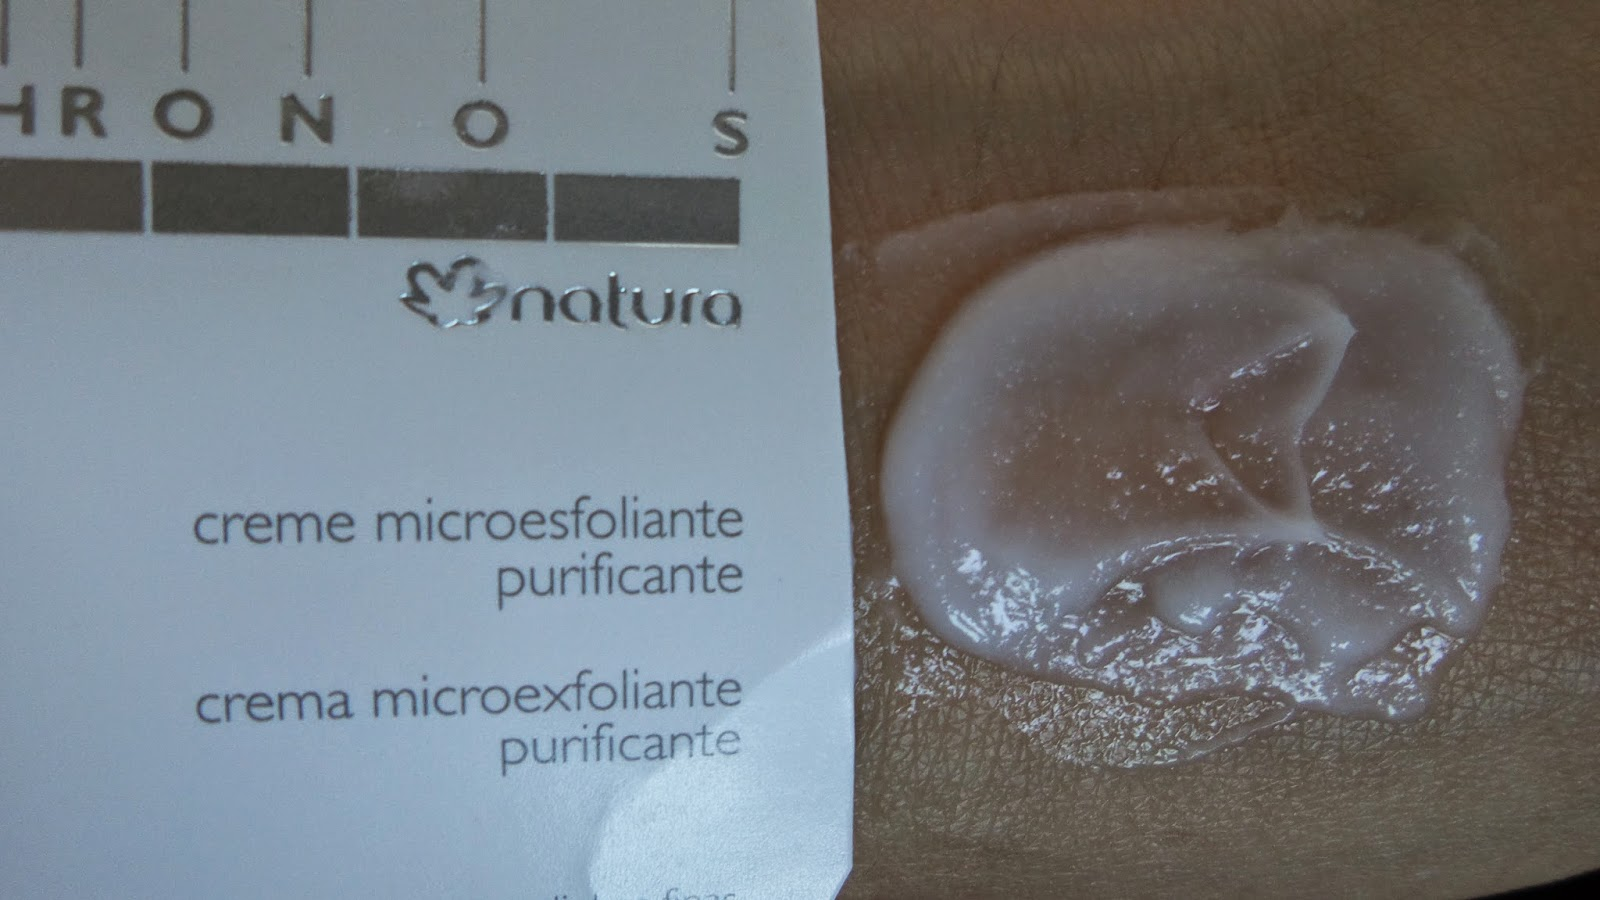 Creme Microesfoliante Purificante Chronos Natura